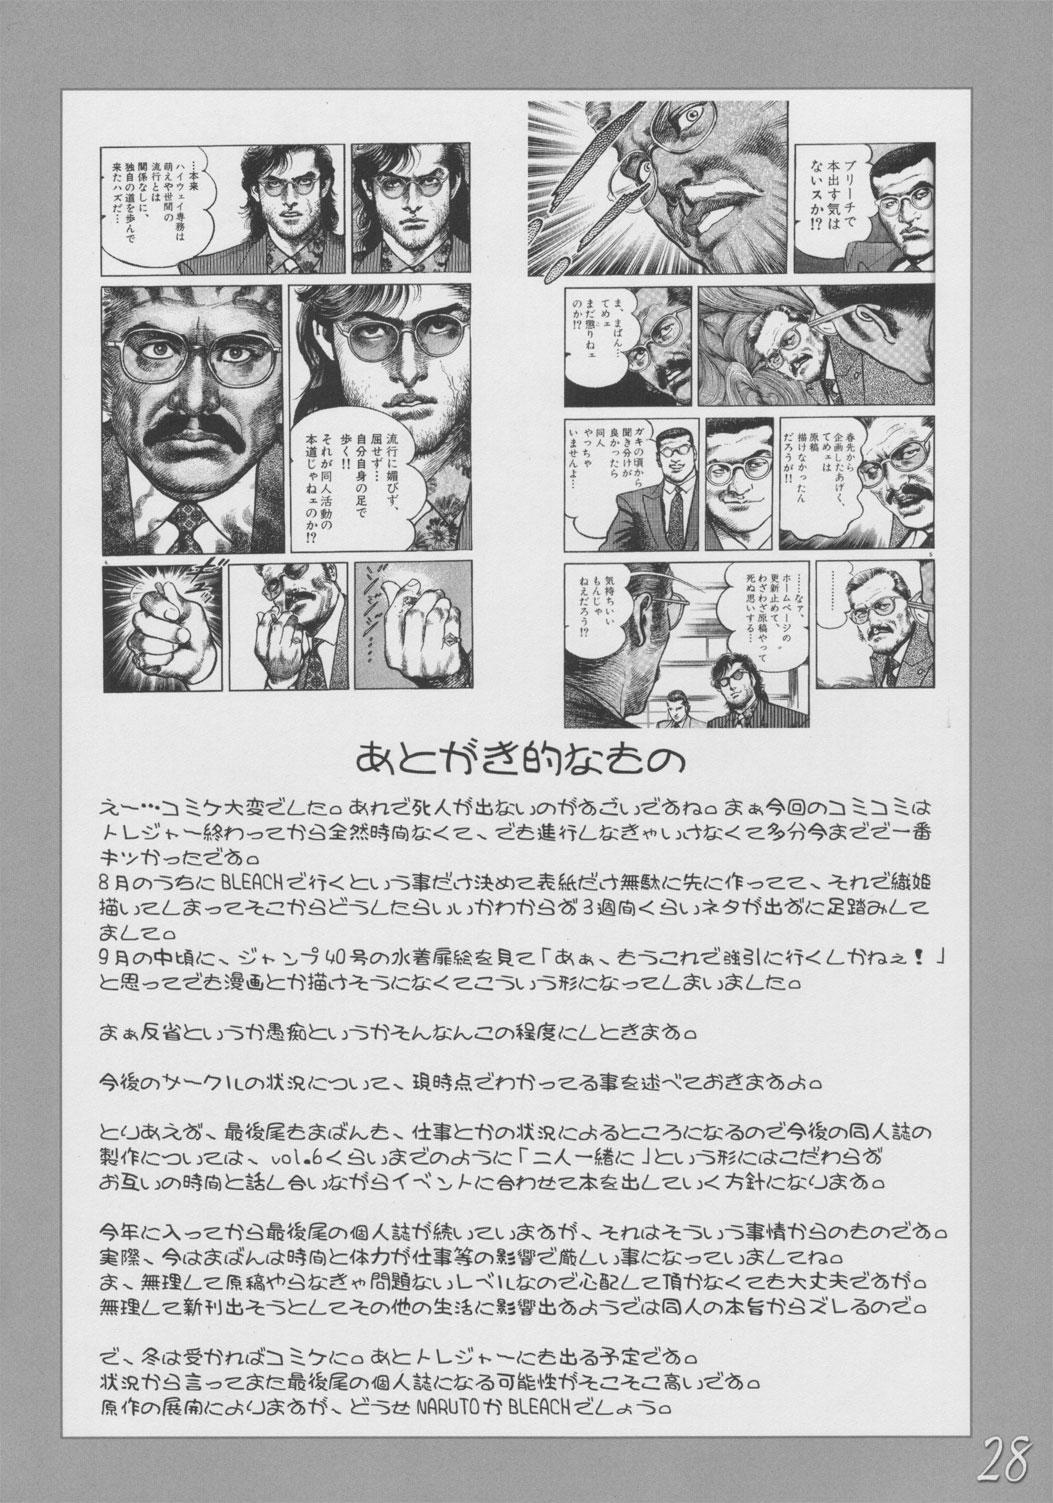 (ComiComi8) [HIGHWAY-SENMU (Maban, Saikoubi)] H-Sen vol. 8 -Erotical noma noma iei!!- (BLEACH) 26